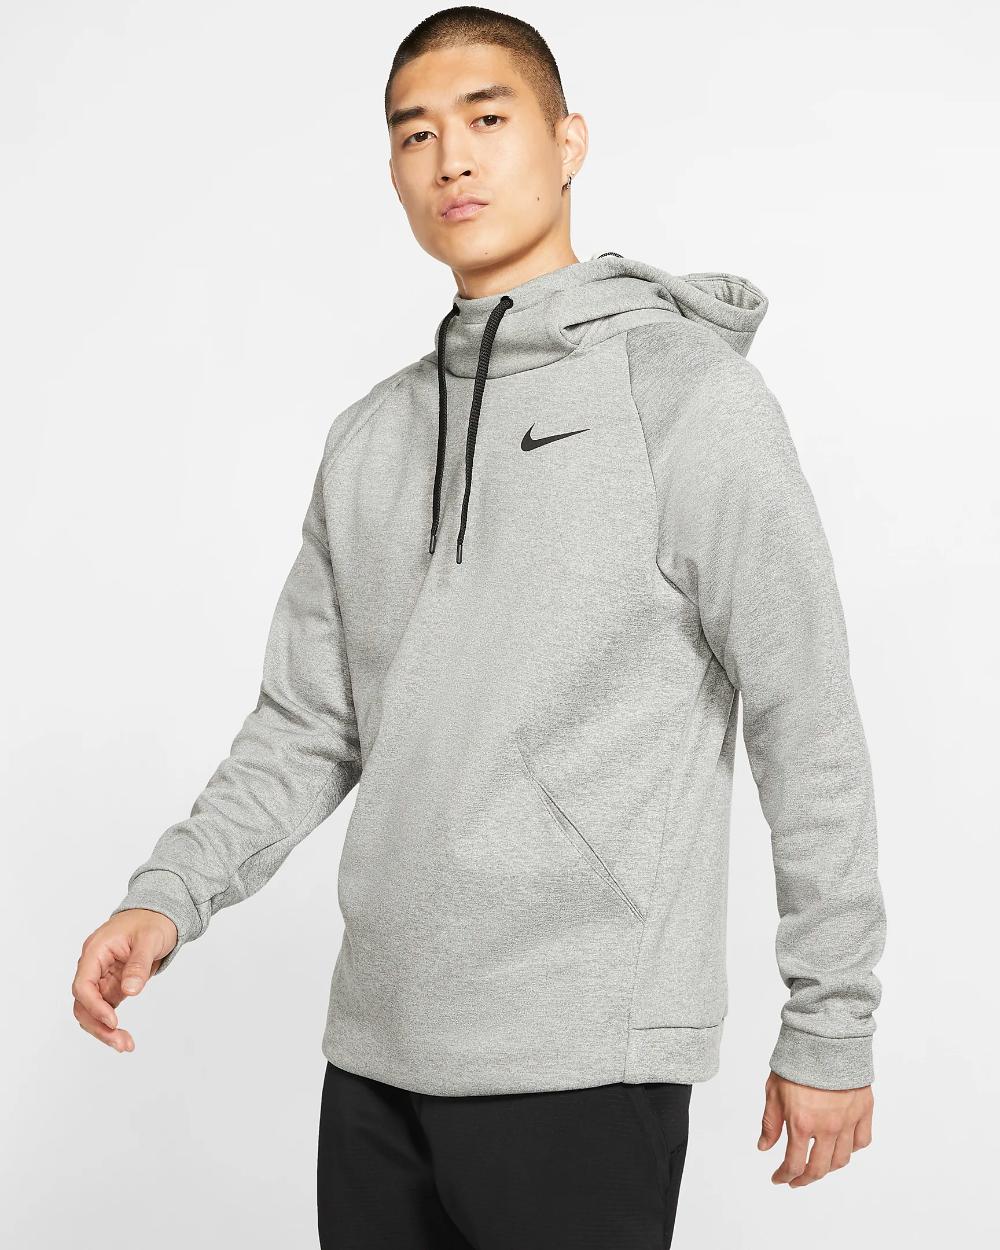 Nike Therma Men S Pullover Training Hoodie Nike Com [ 1250 x 1000 Pixel ]